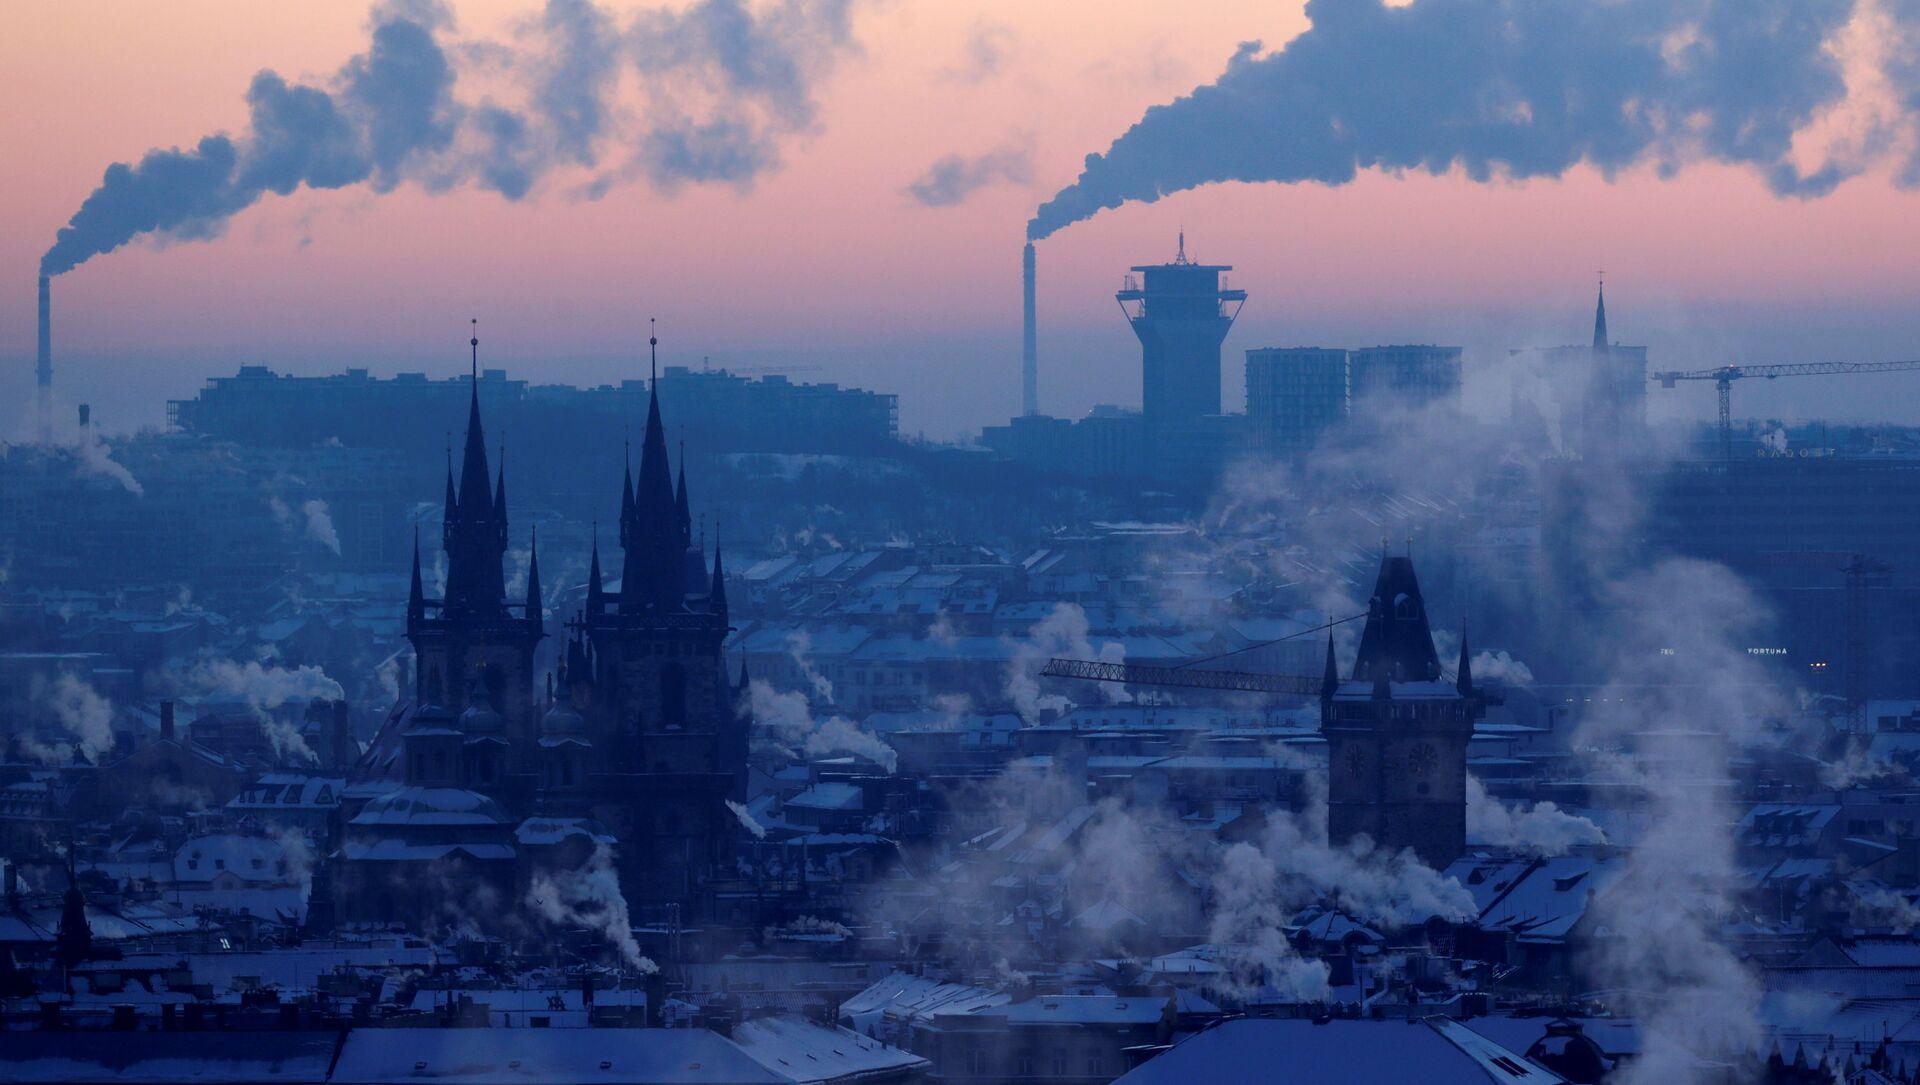 Praha - Sputnik Česká republika, 1920, 29.03.2021